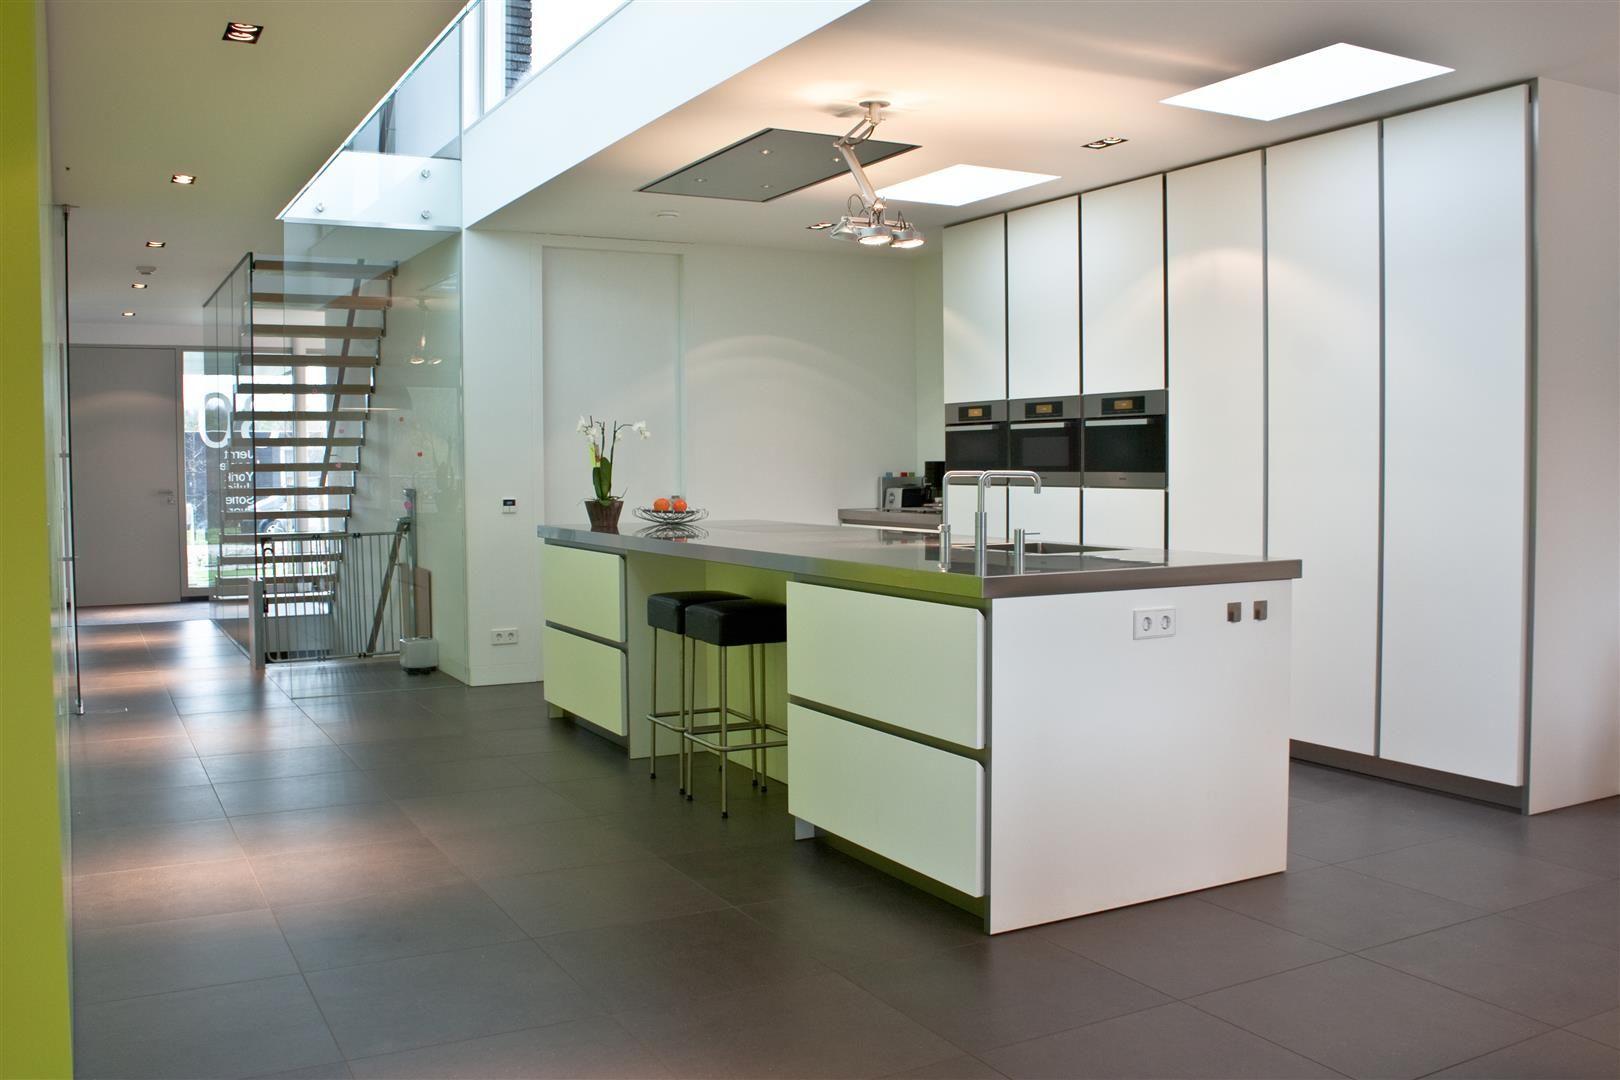 Tegels en houten vloer overgang strak zonder profiel - Faience giet keuken moderne ...